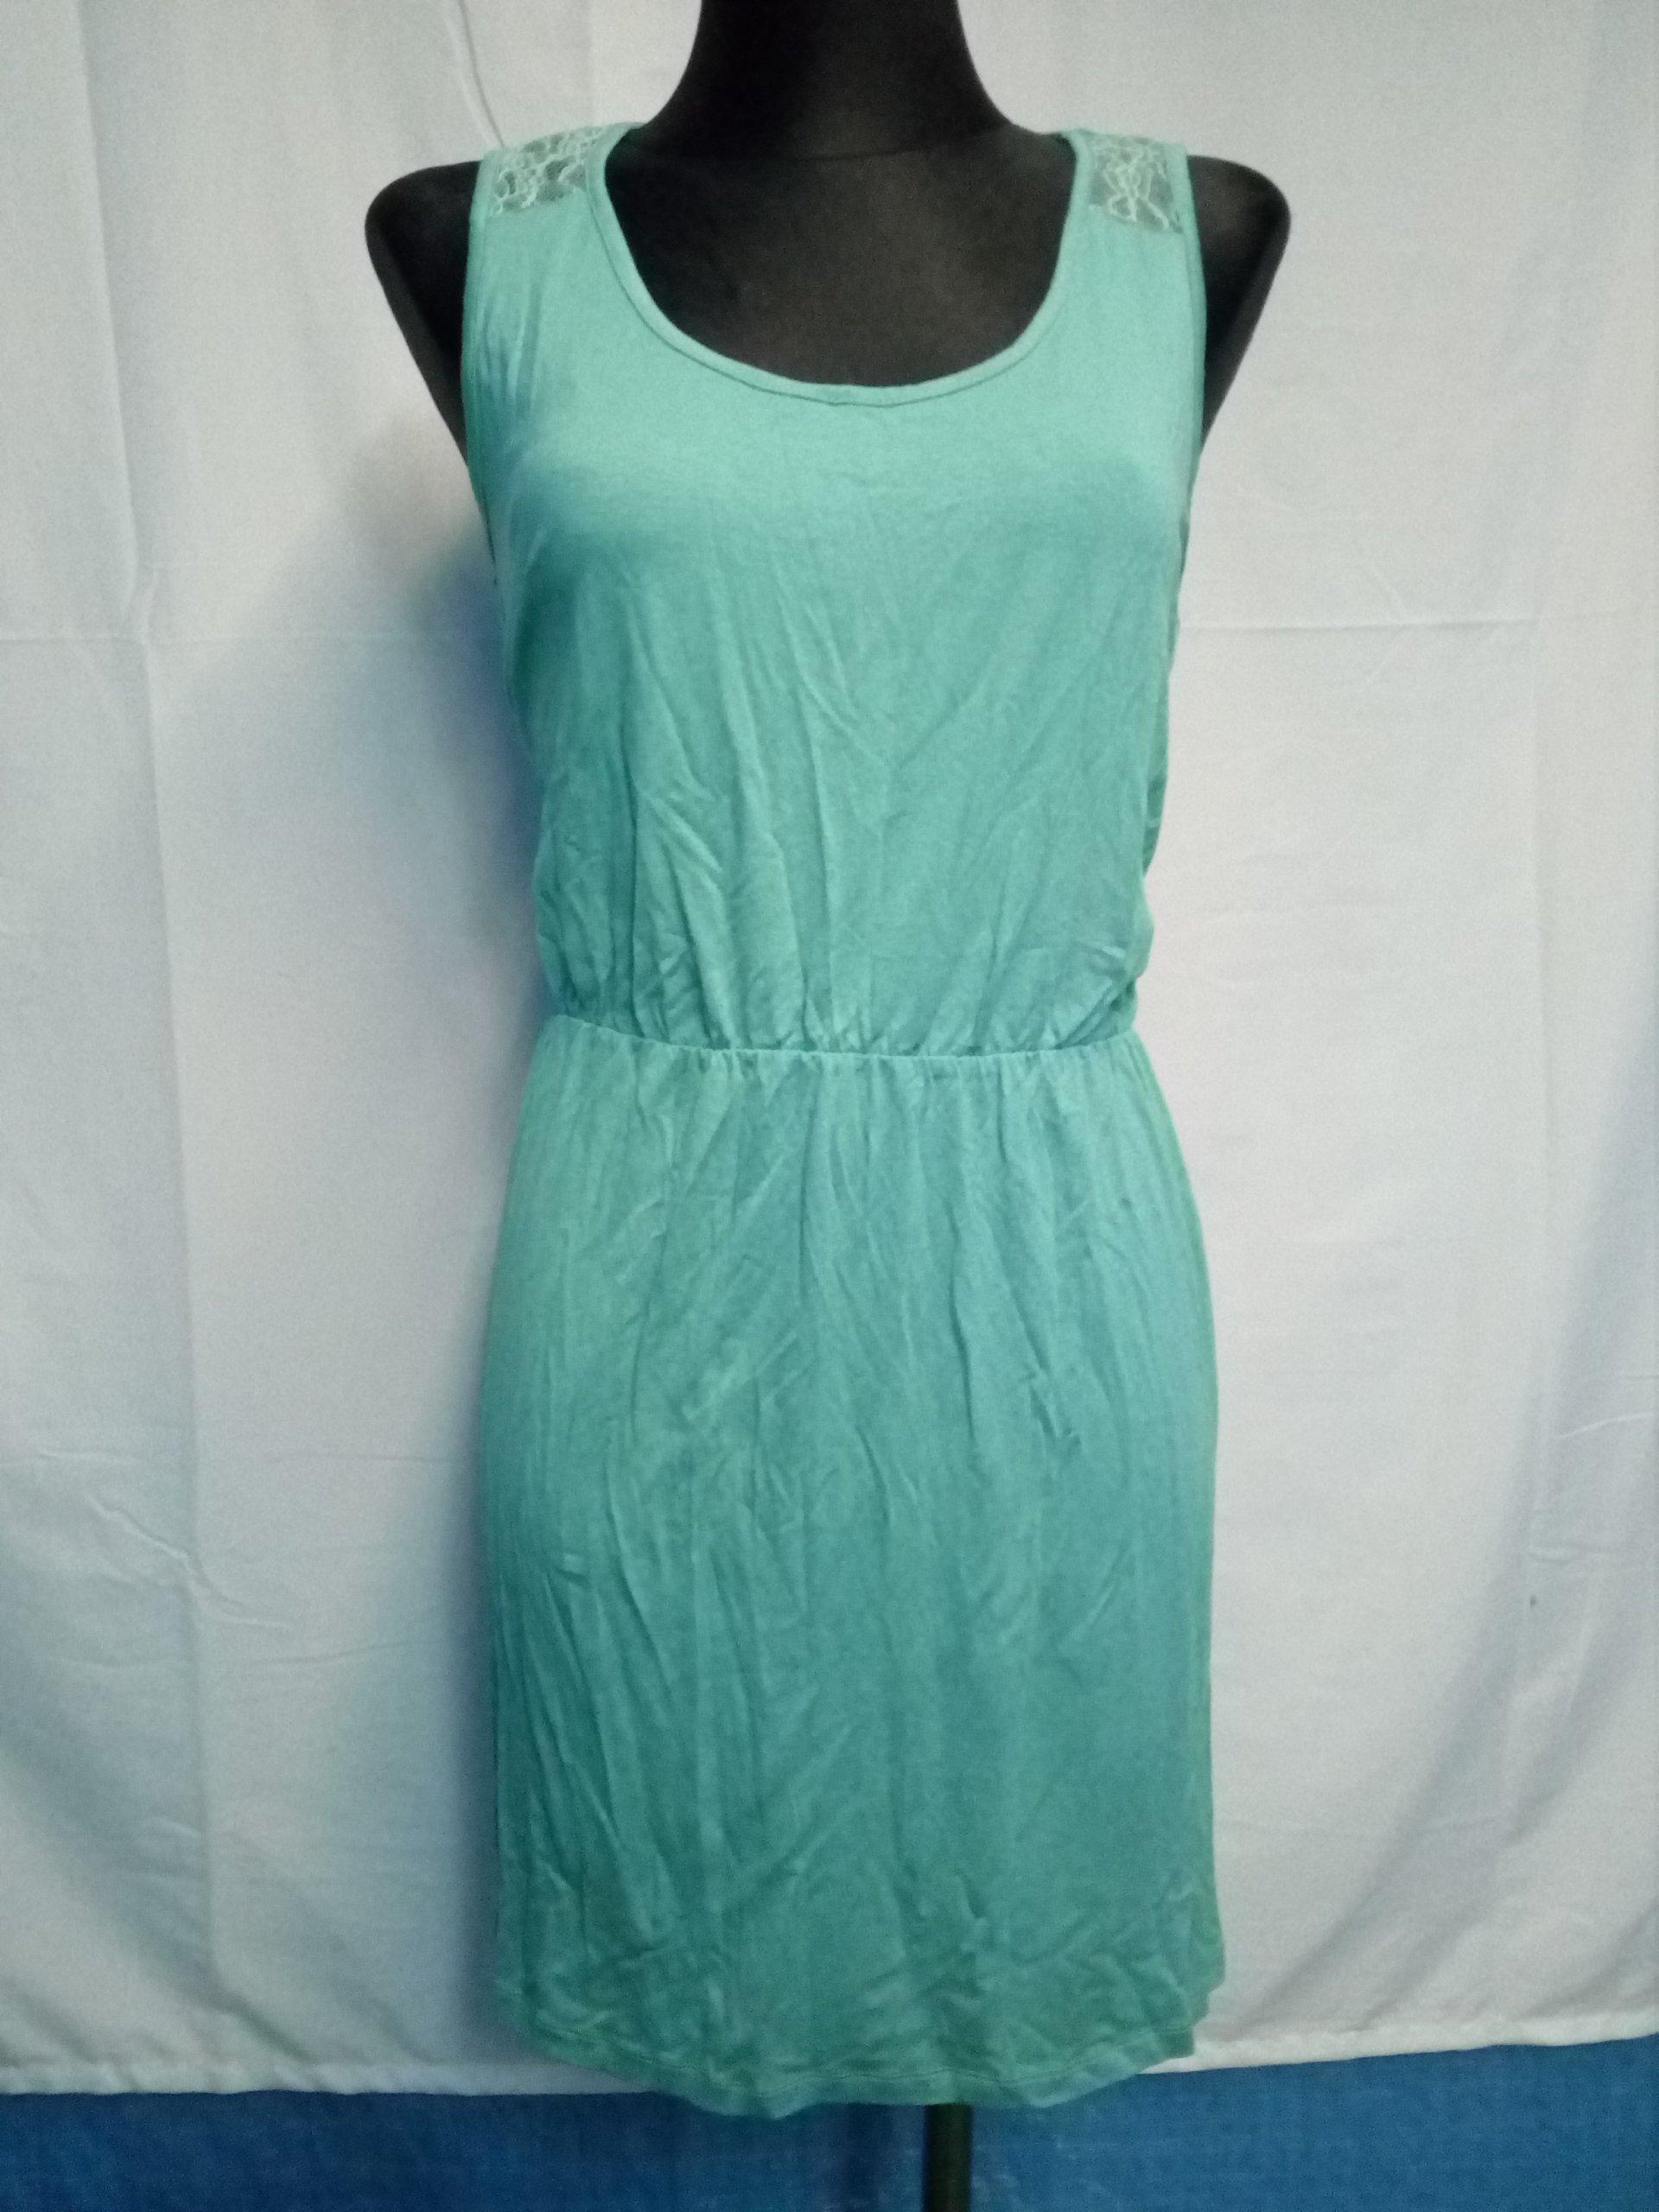 0598db70e2 Sukienka Lato BODYFILTR Bon Prix rozm.40 42 - 7522602973 - oficjalne ...